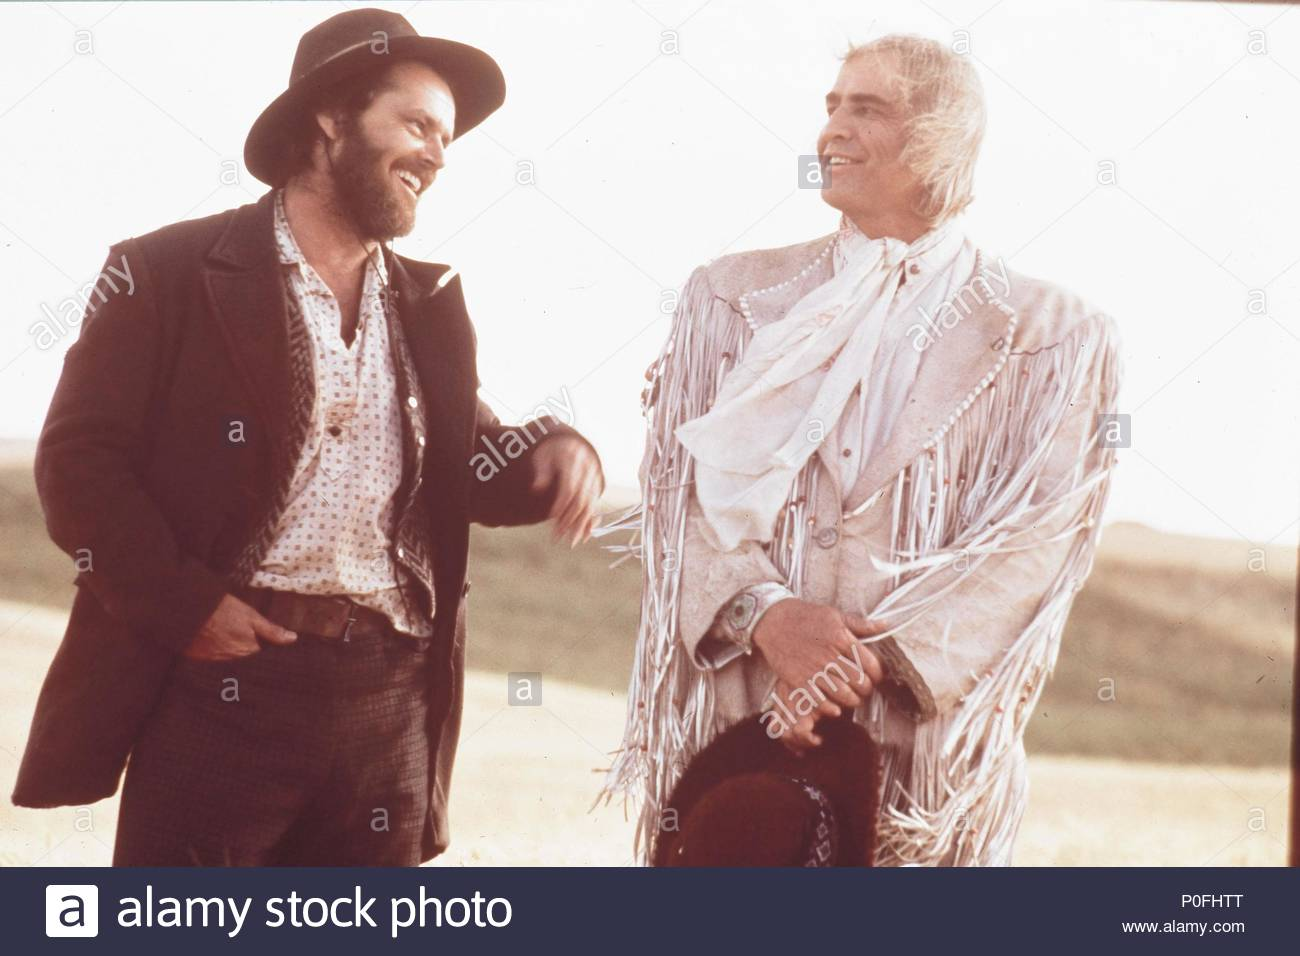 Original Film Title: THE MISSOURI BREAKS.  English Title: THE MISSOURI BREAKS.  Film Director: ARTHUR PENN.  Year: 1976.  Stars: JACK NICHOLSON; MARLON BRANDO. Credit: UNITED ARTISTS / Album - Stock Image